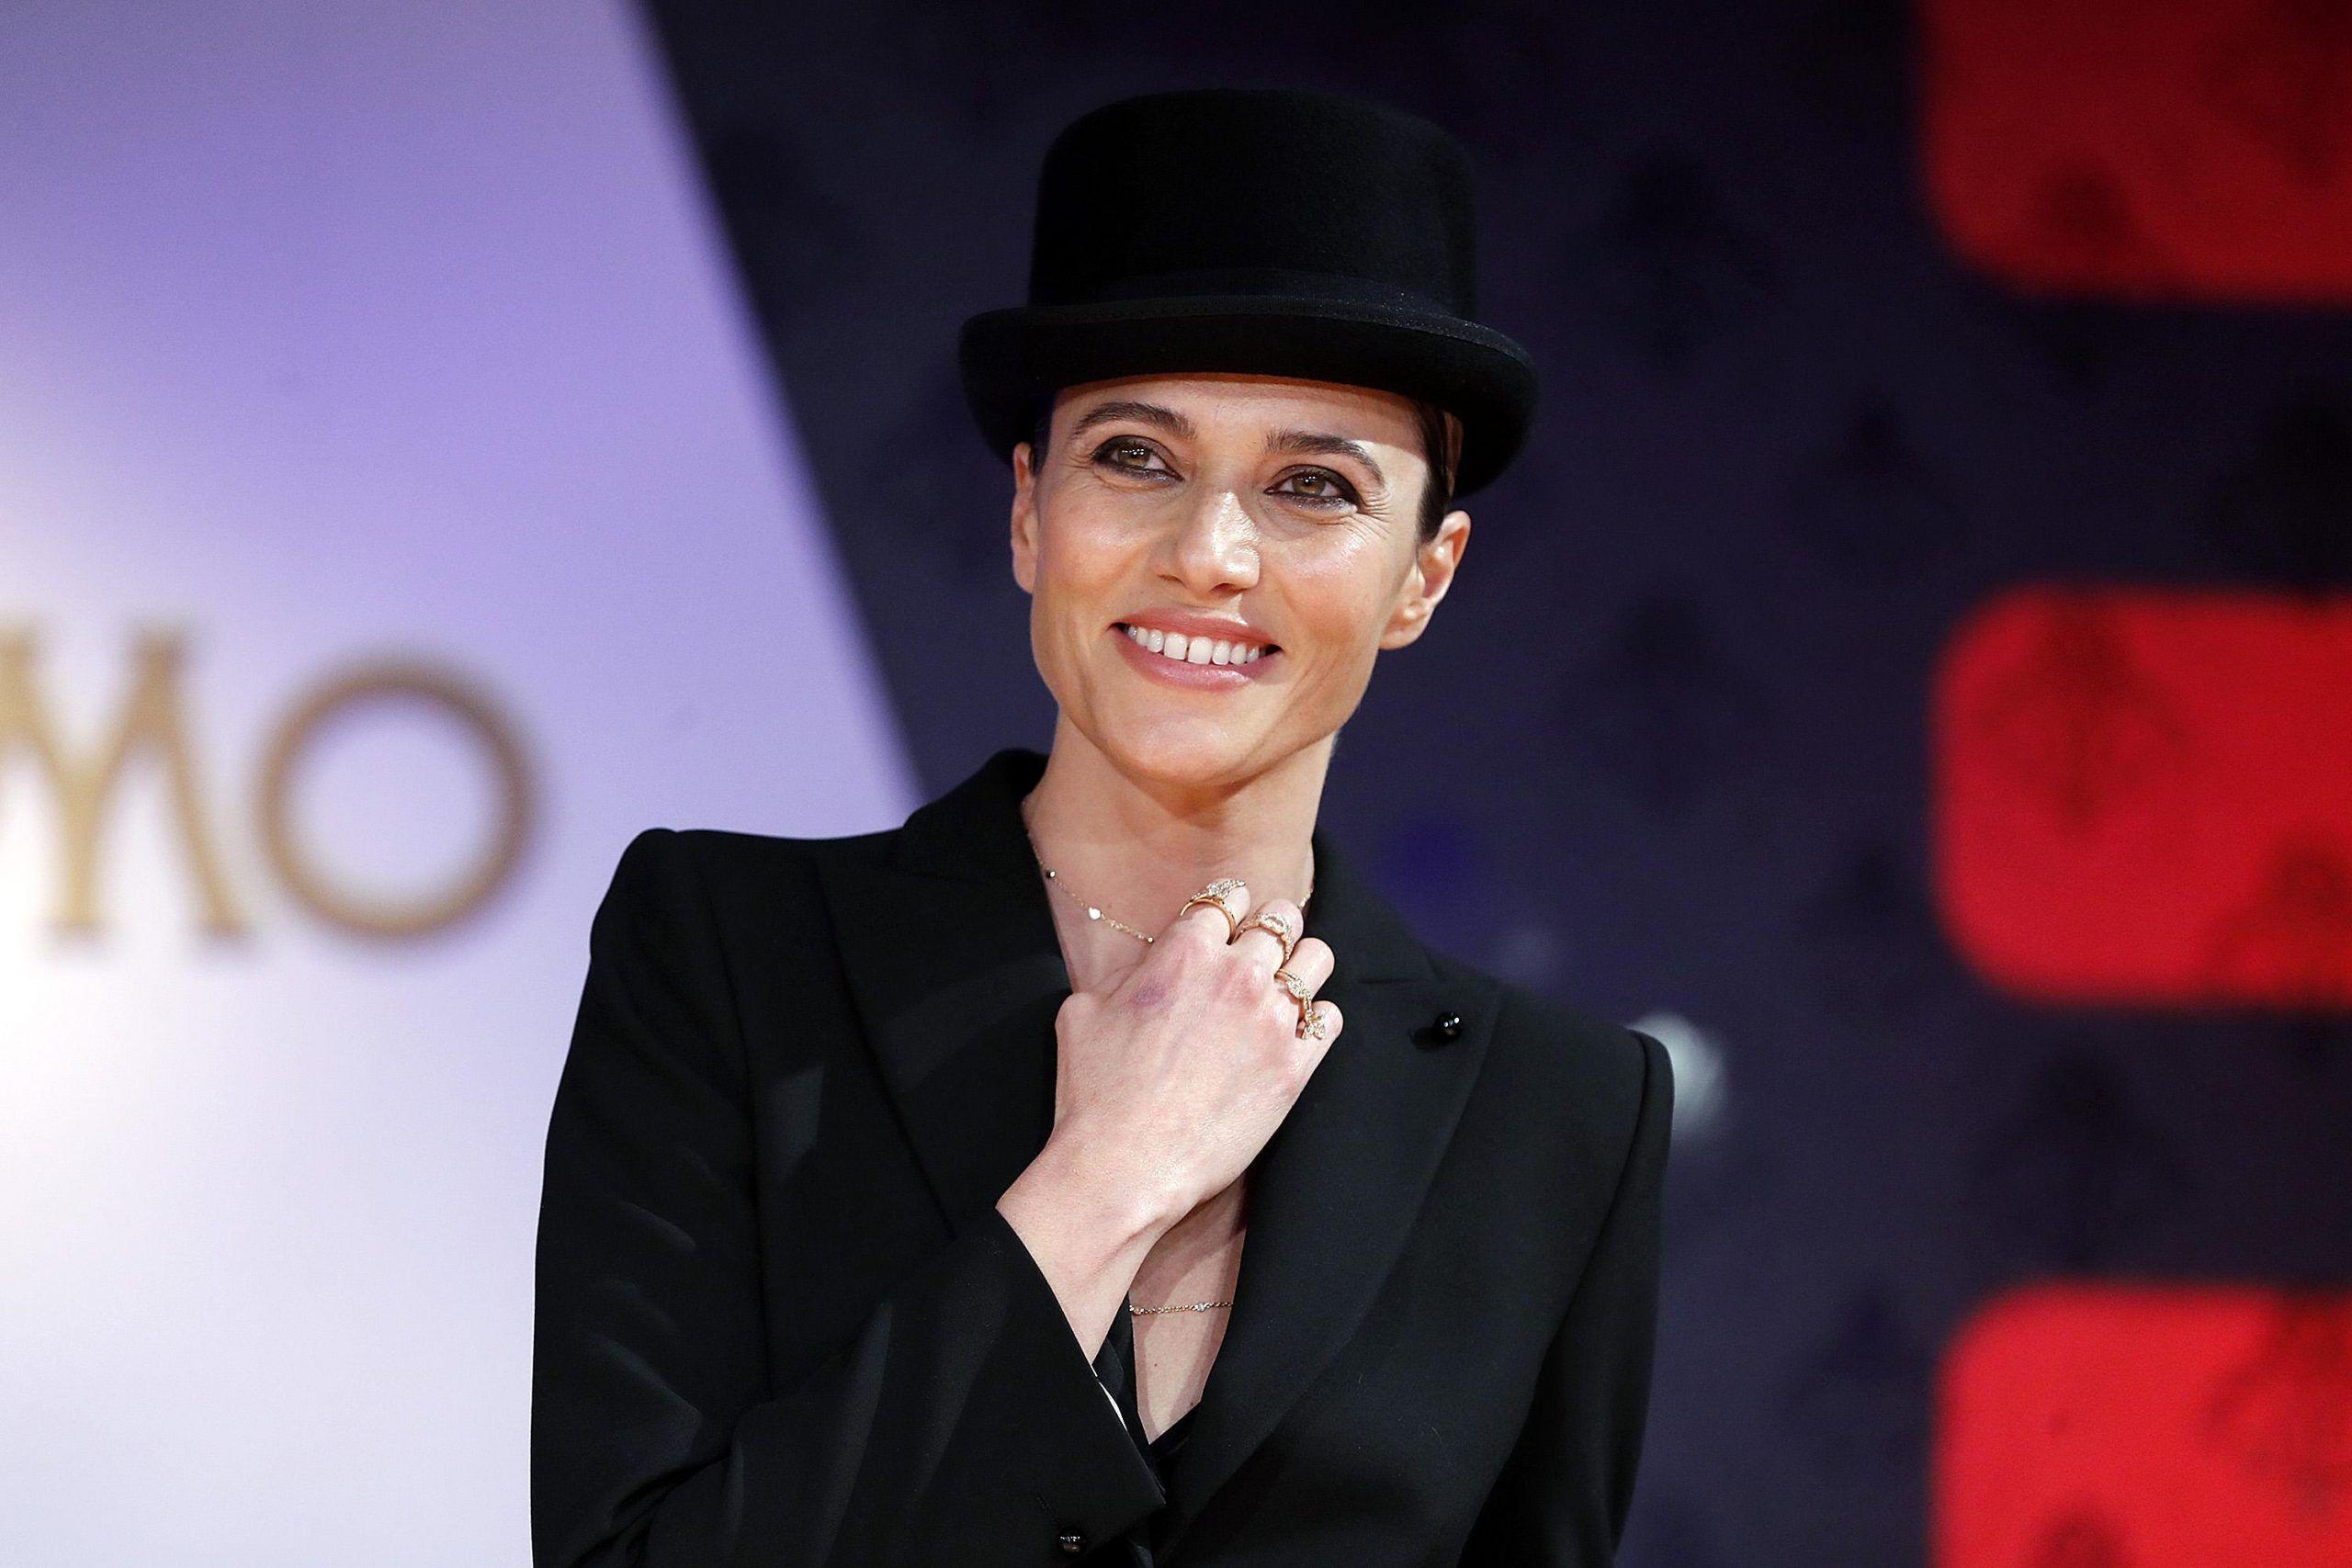 Sanremo 2019 Anna Foglietta gaffe